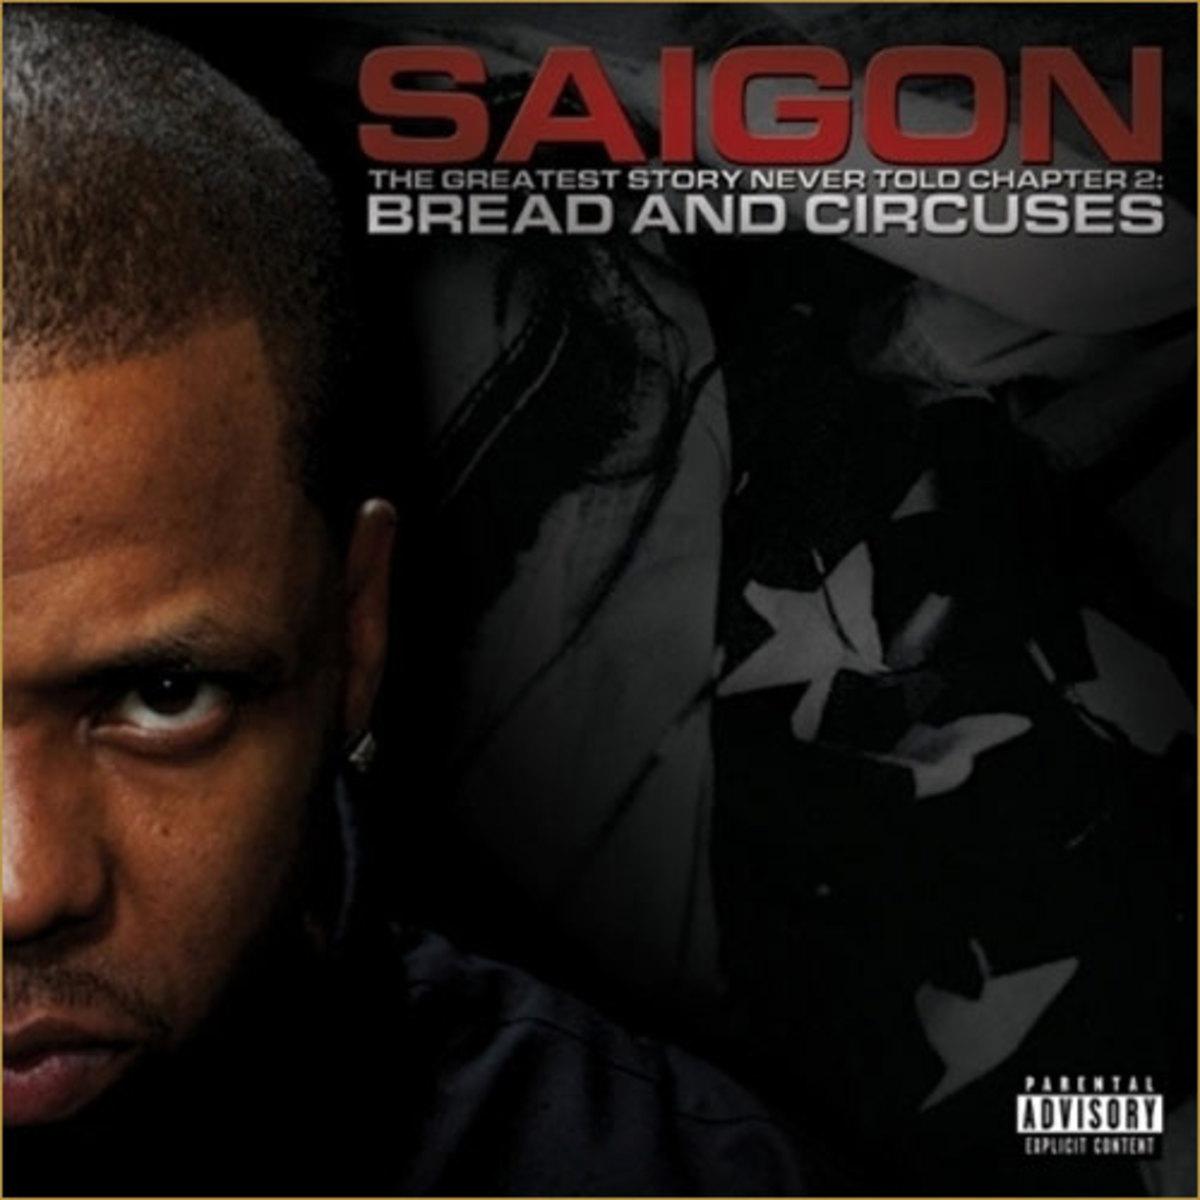 saigon-breadcircus.jpg